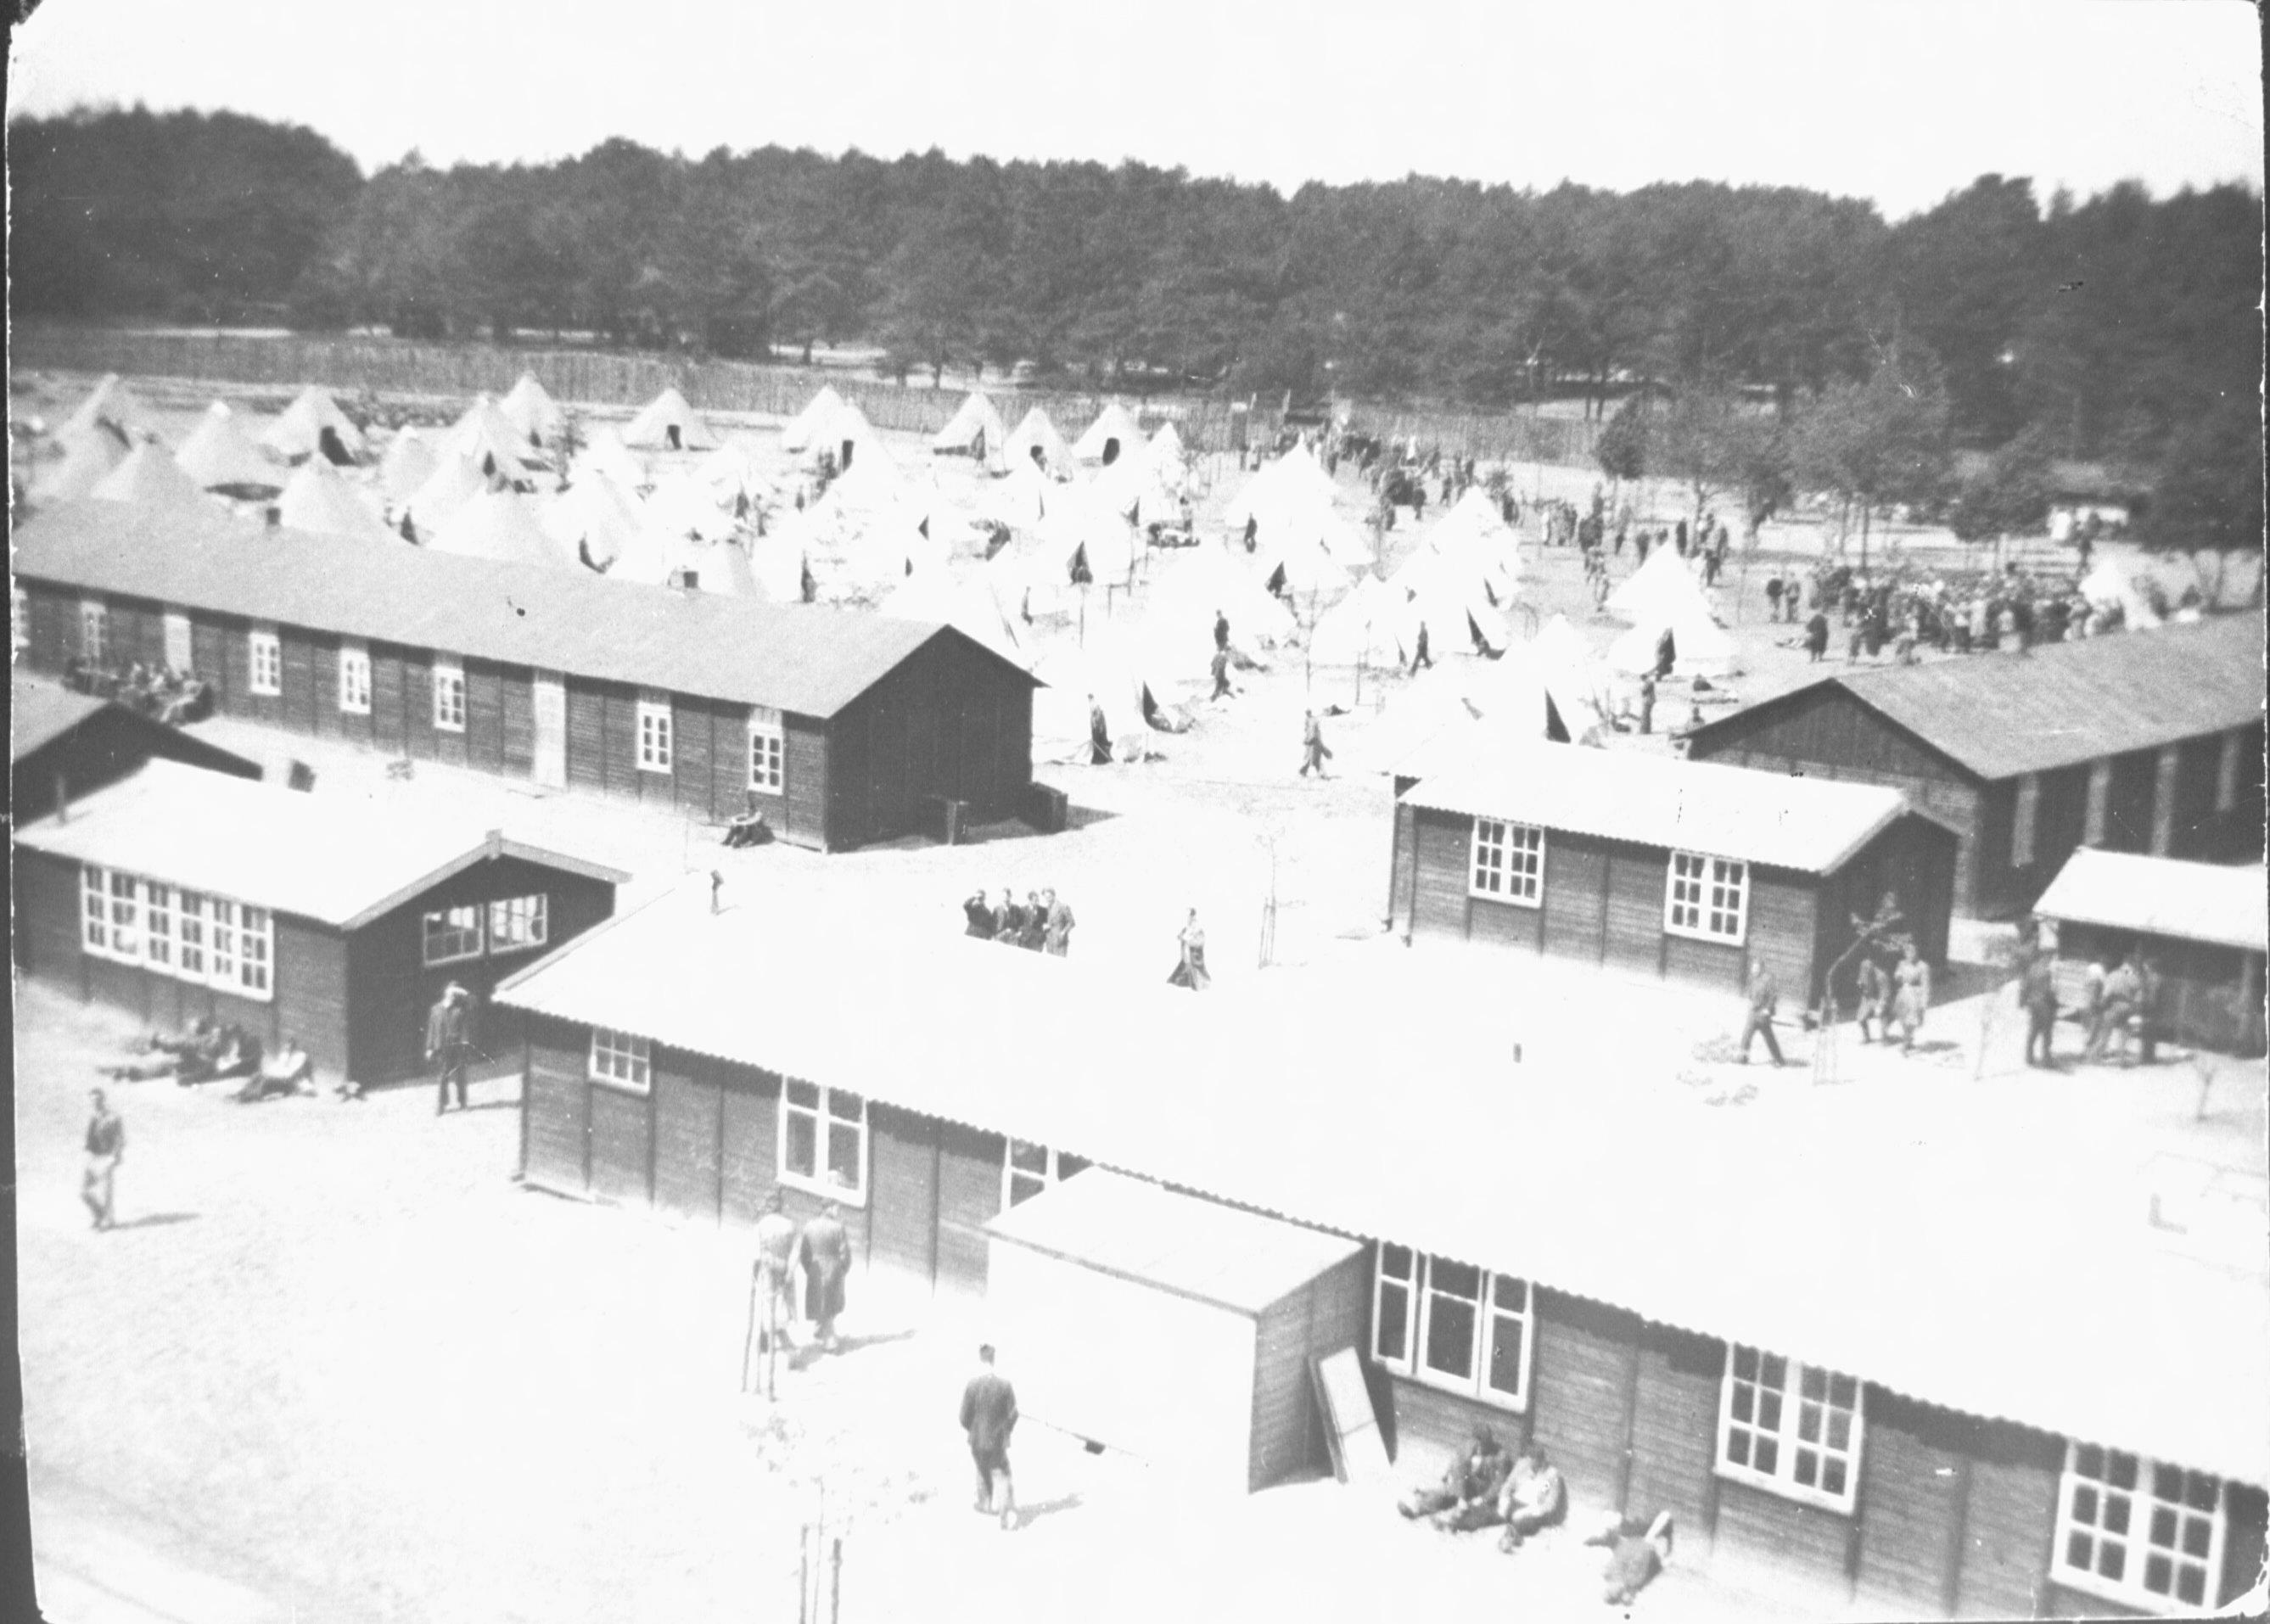 Kamp Erika in 1943